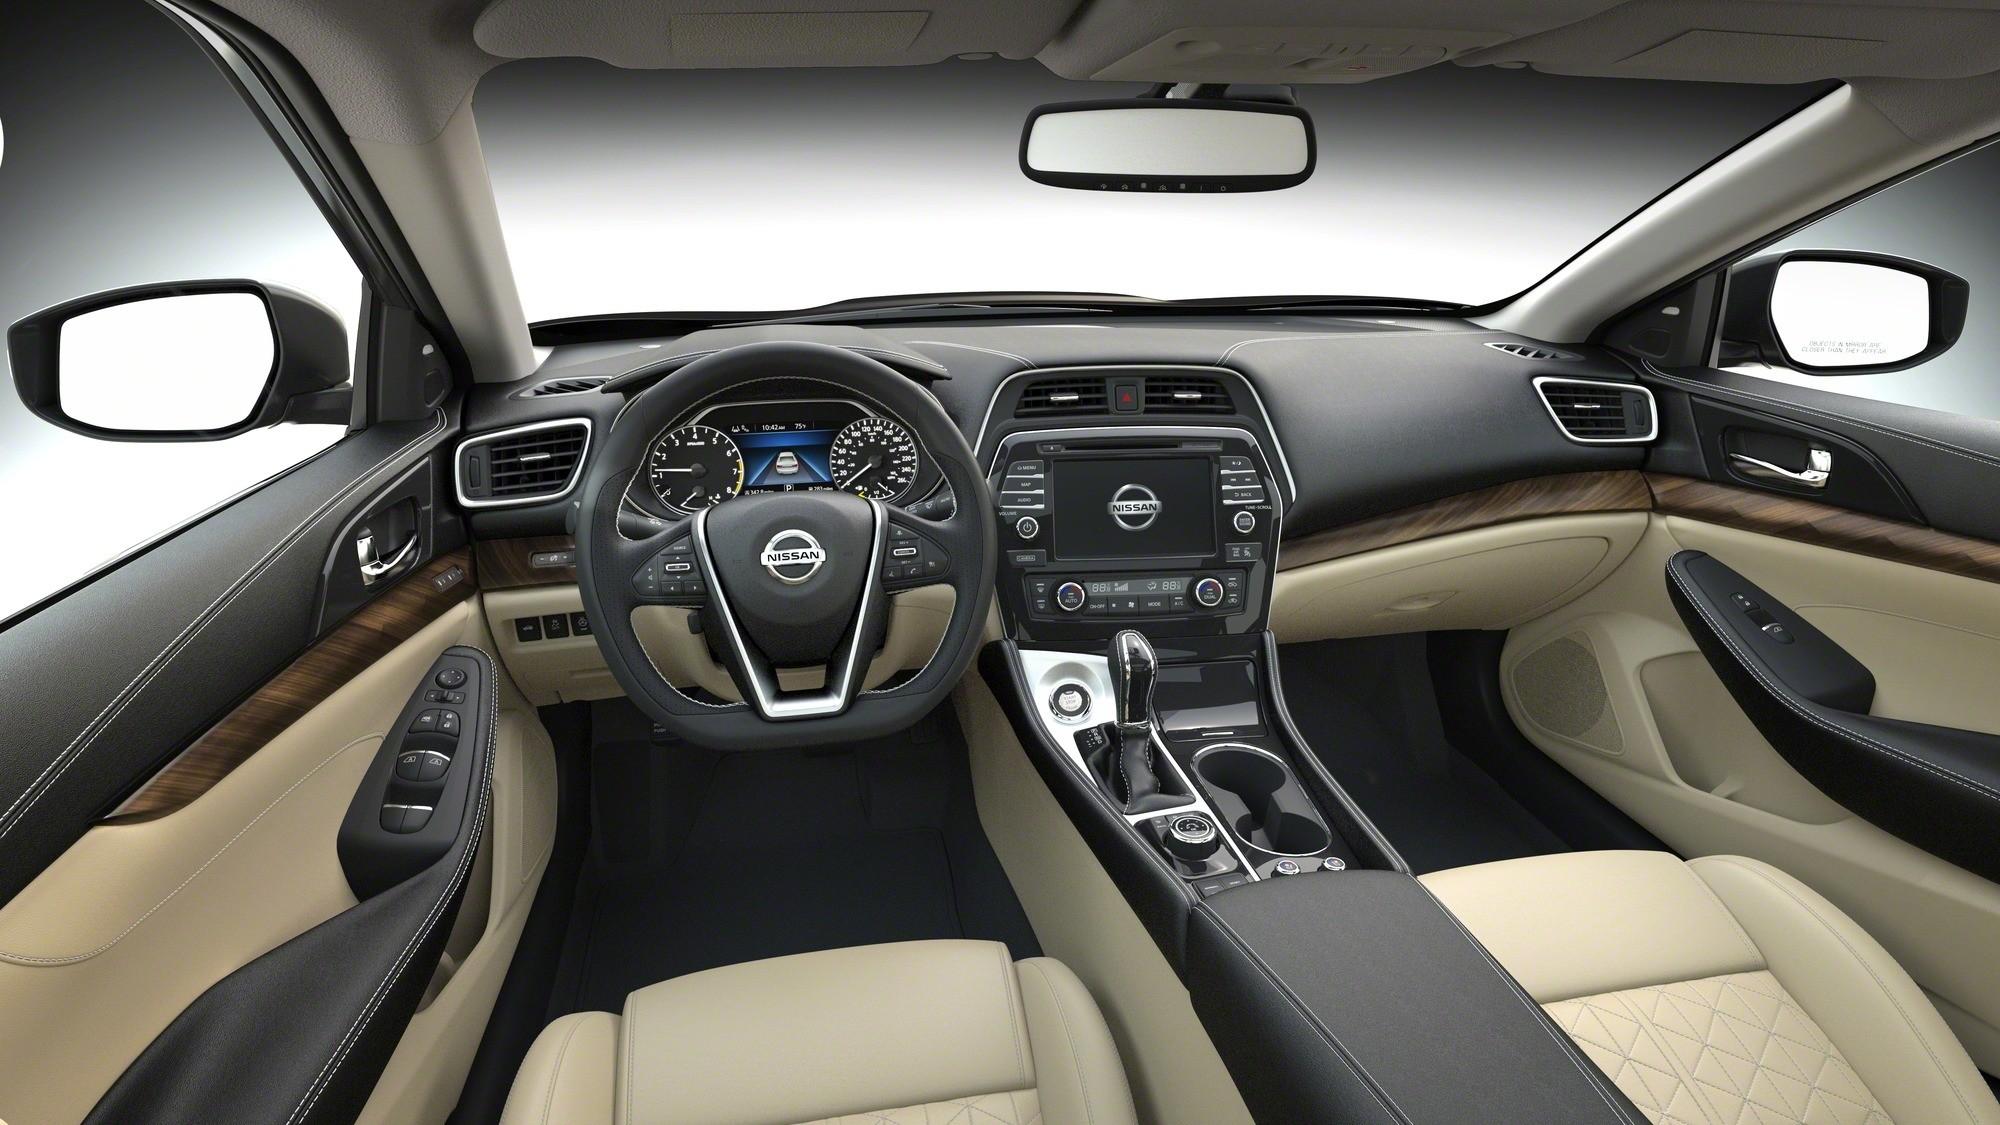 2016 Nissan Maxima Review - autoevolution